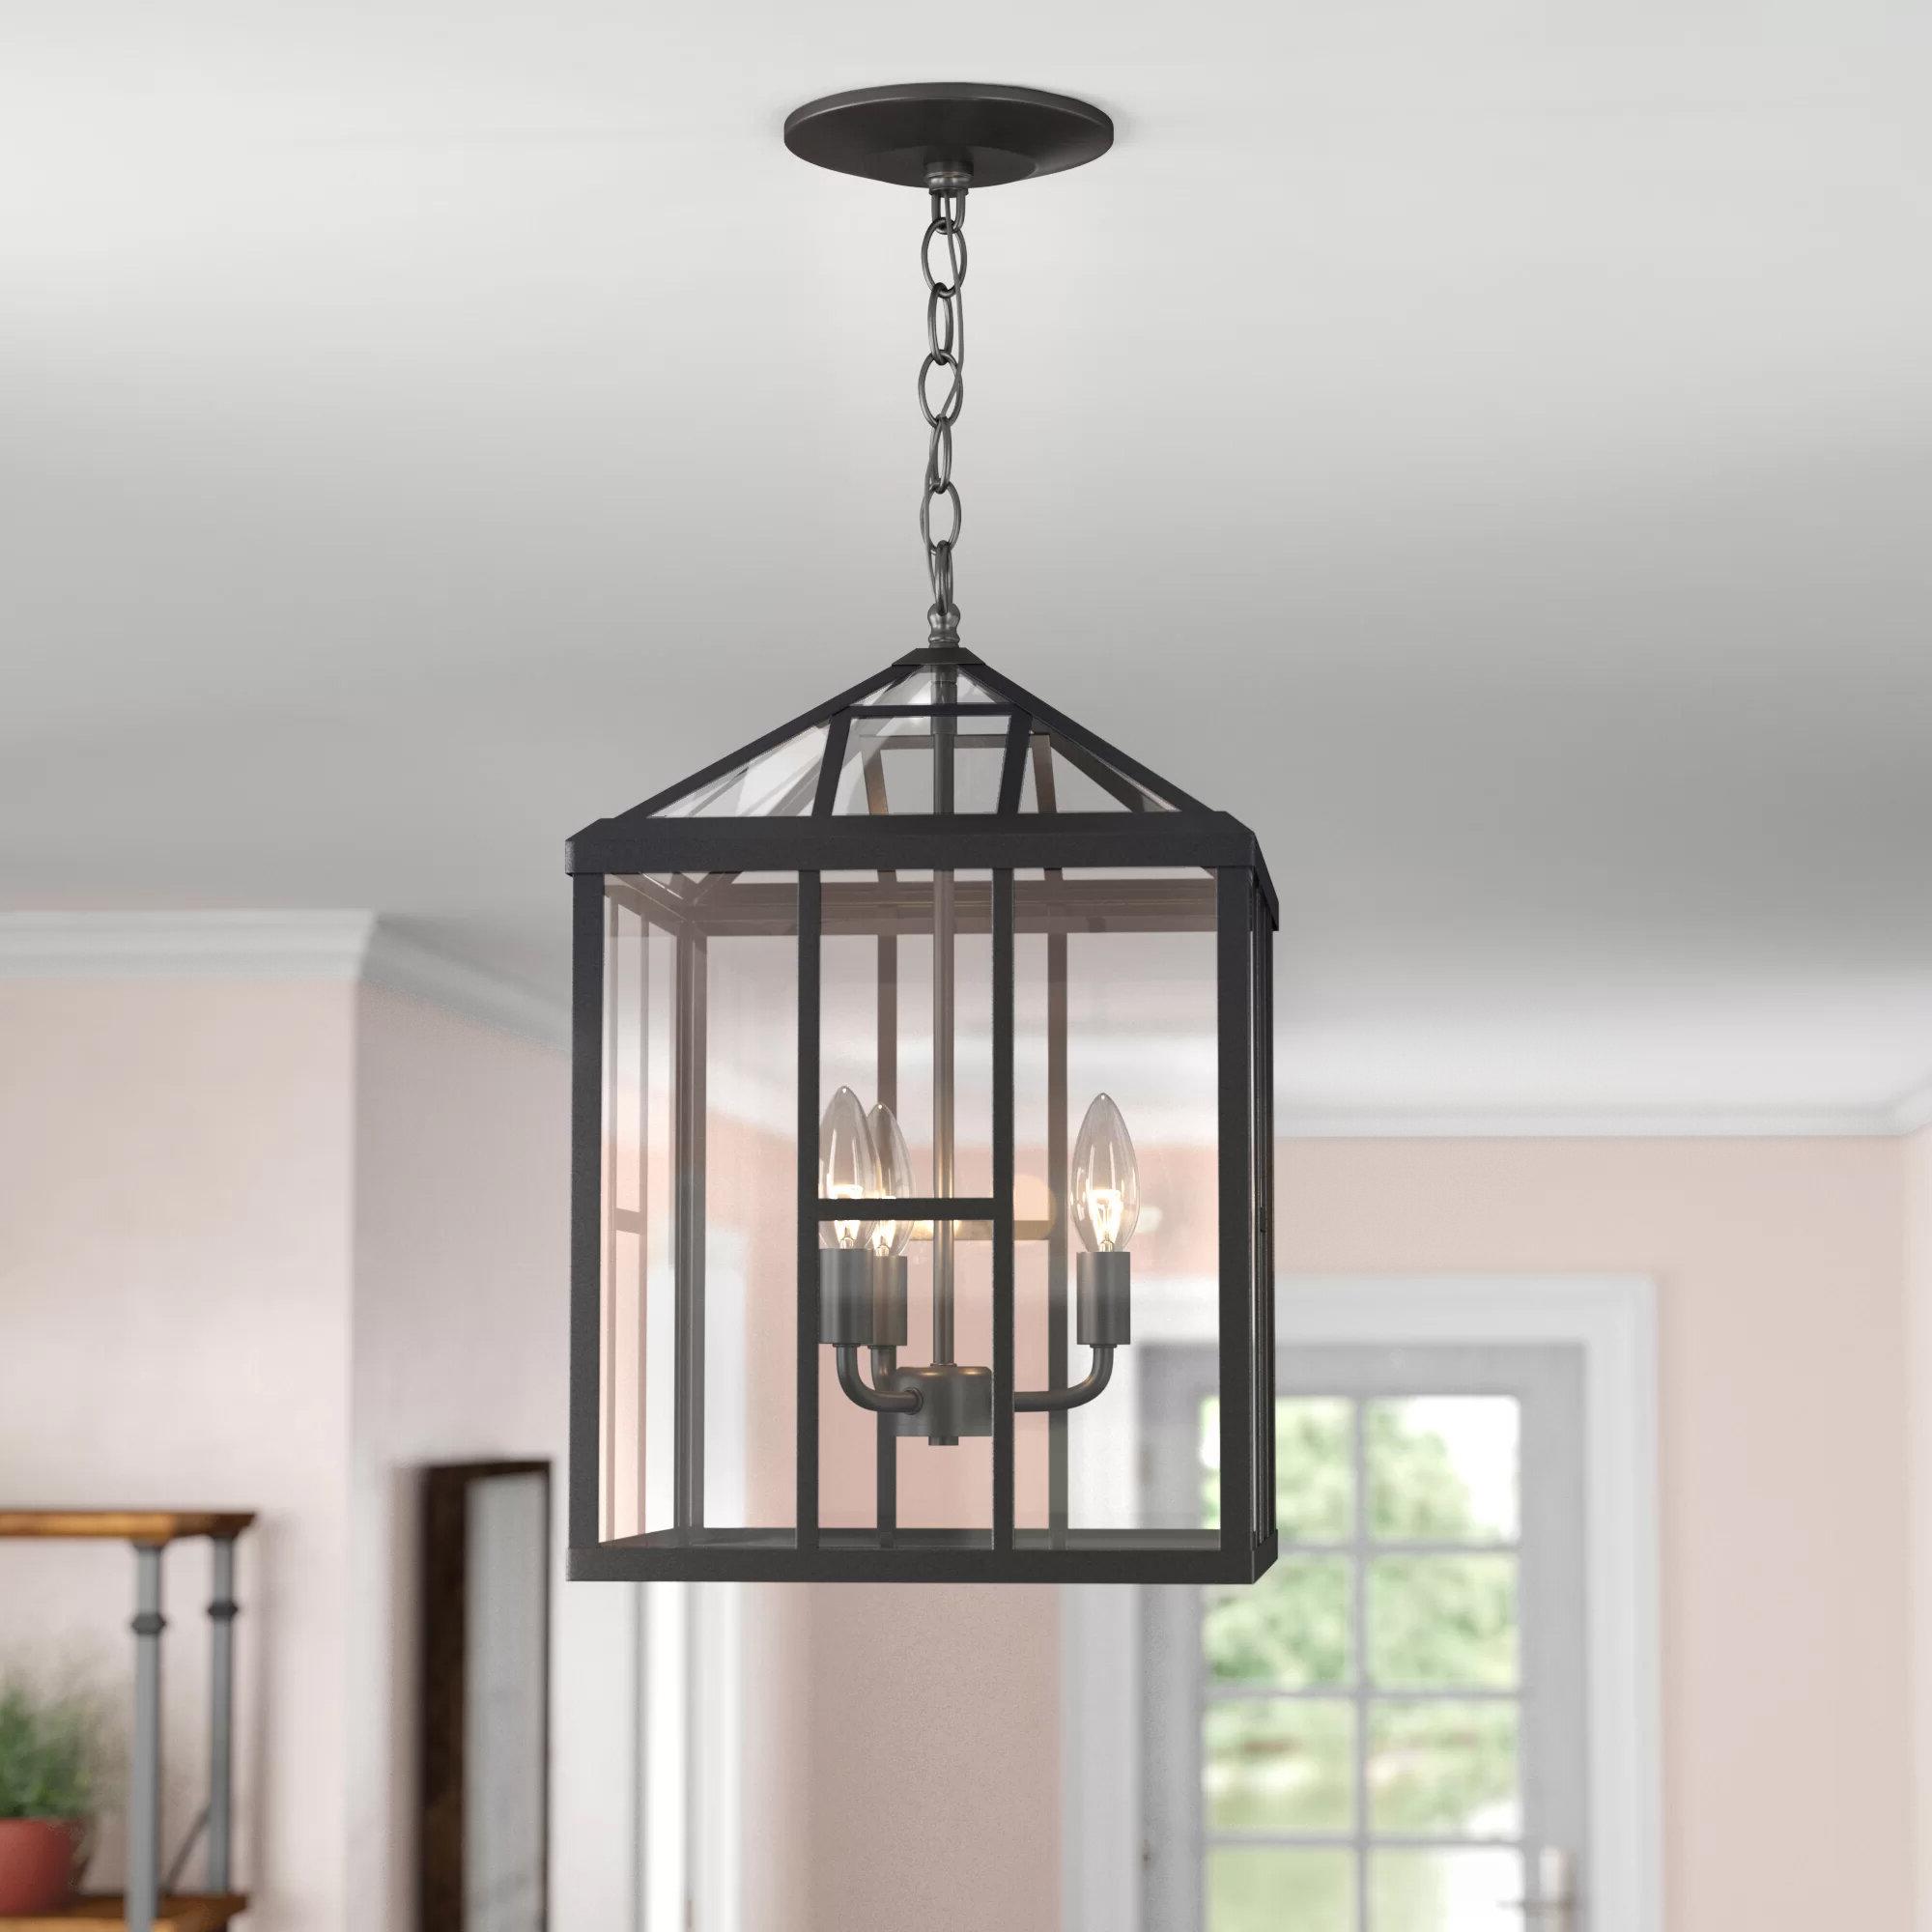 Adelaida 3 Light Lantern Geometric Pendant Regarding 2019 Sherri Ann 3 Light Lantern Square / Rectangle Pendants (View 1 of 25)